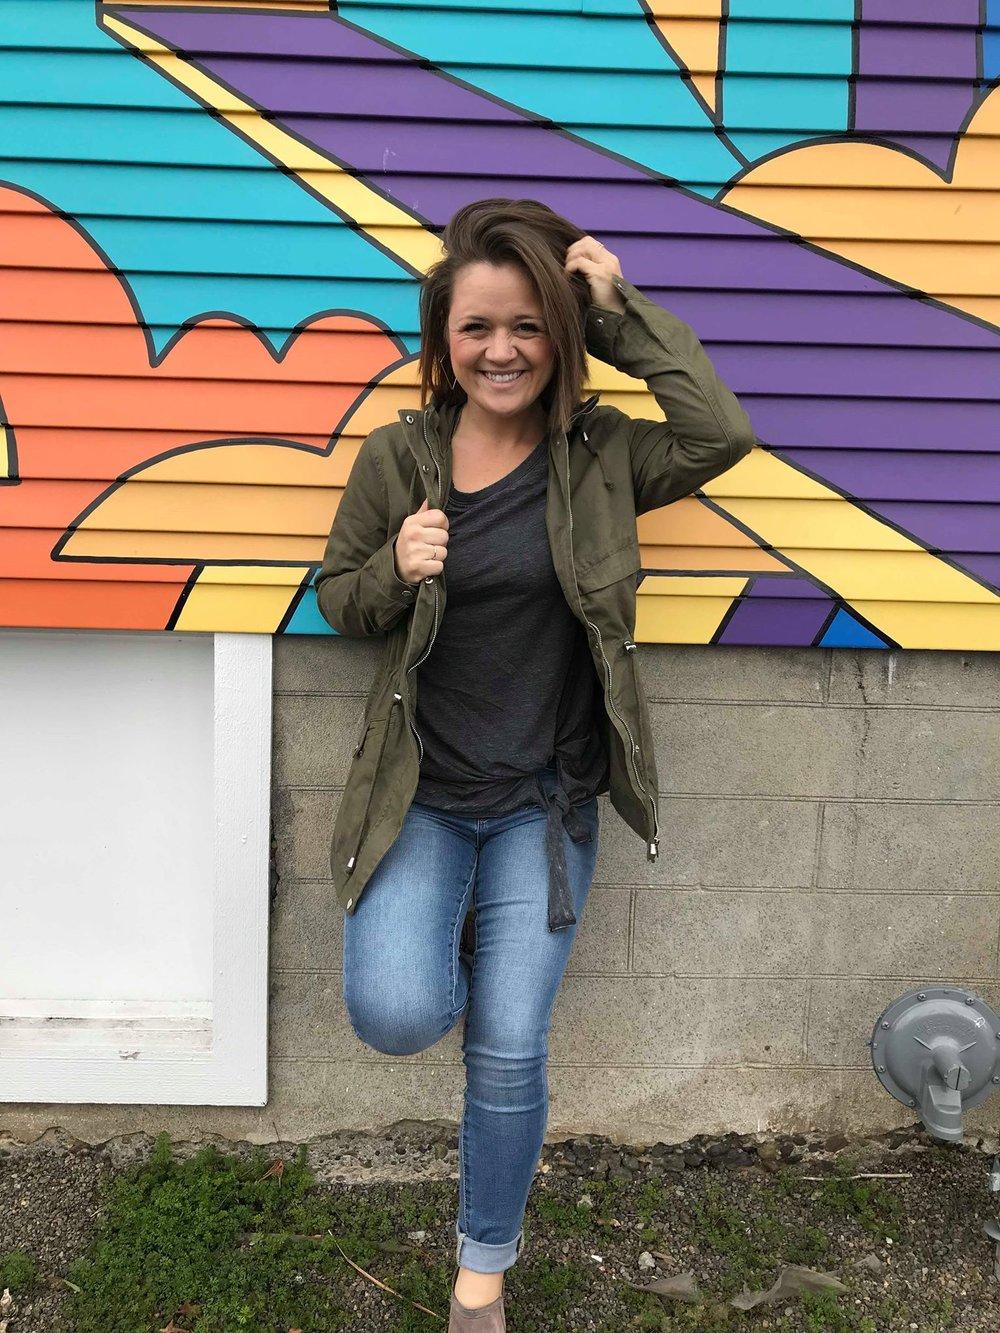 natalie brenner, portland oregon, bright wall